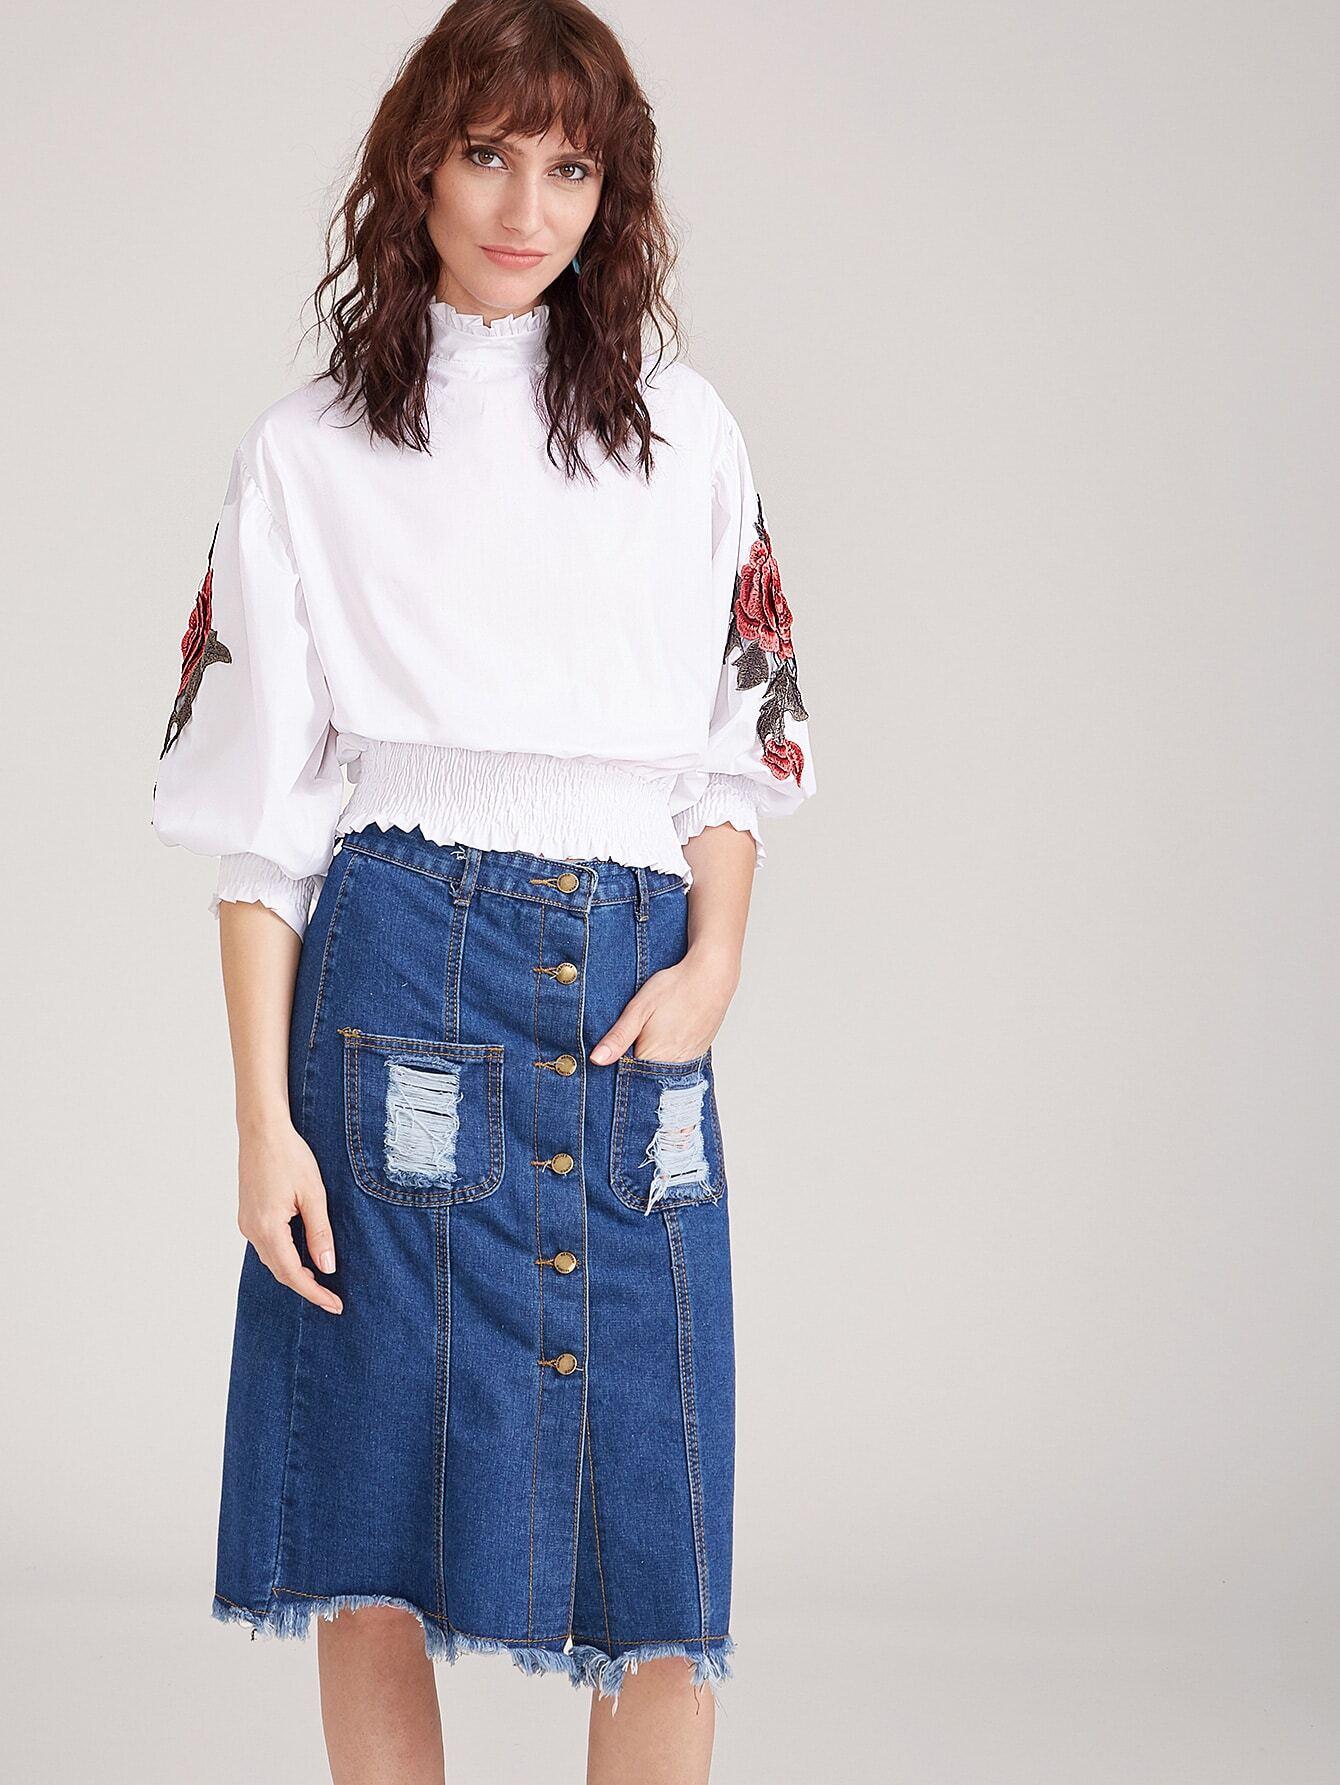 blouse170301005_2